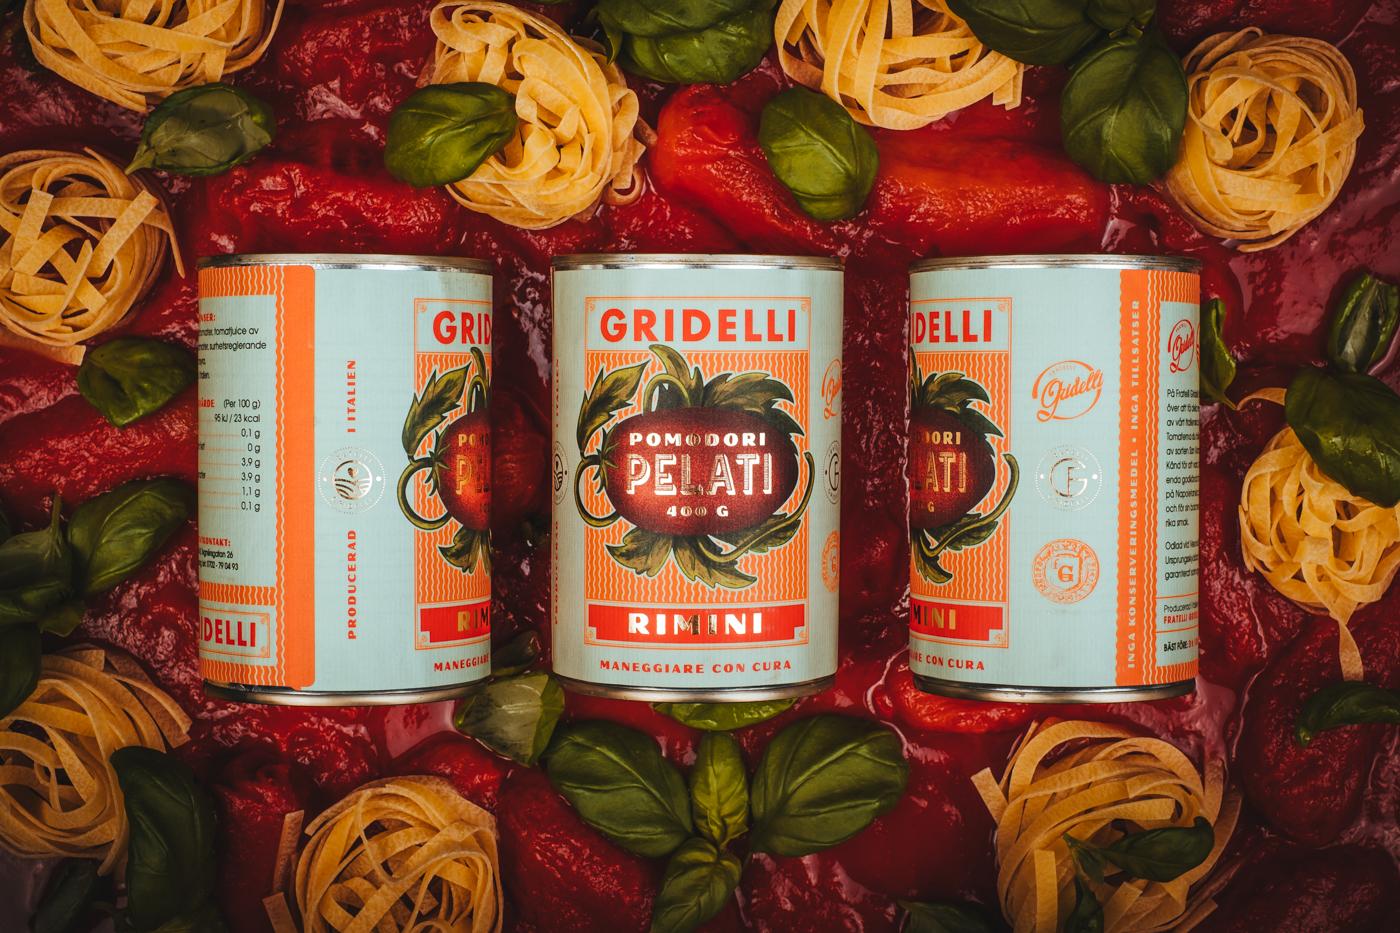 Gridelli_Pomodori-3648